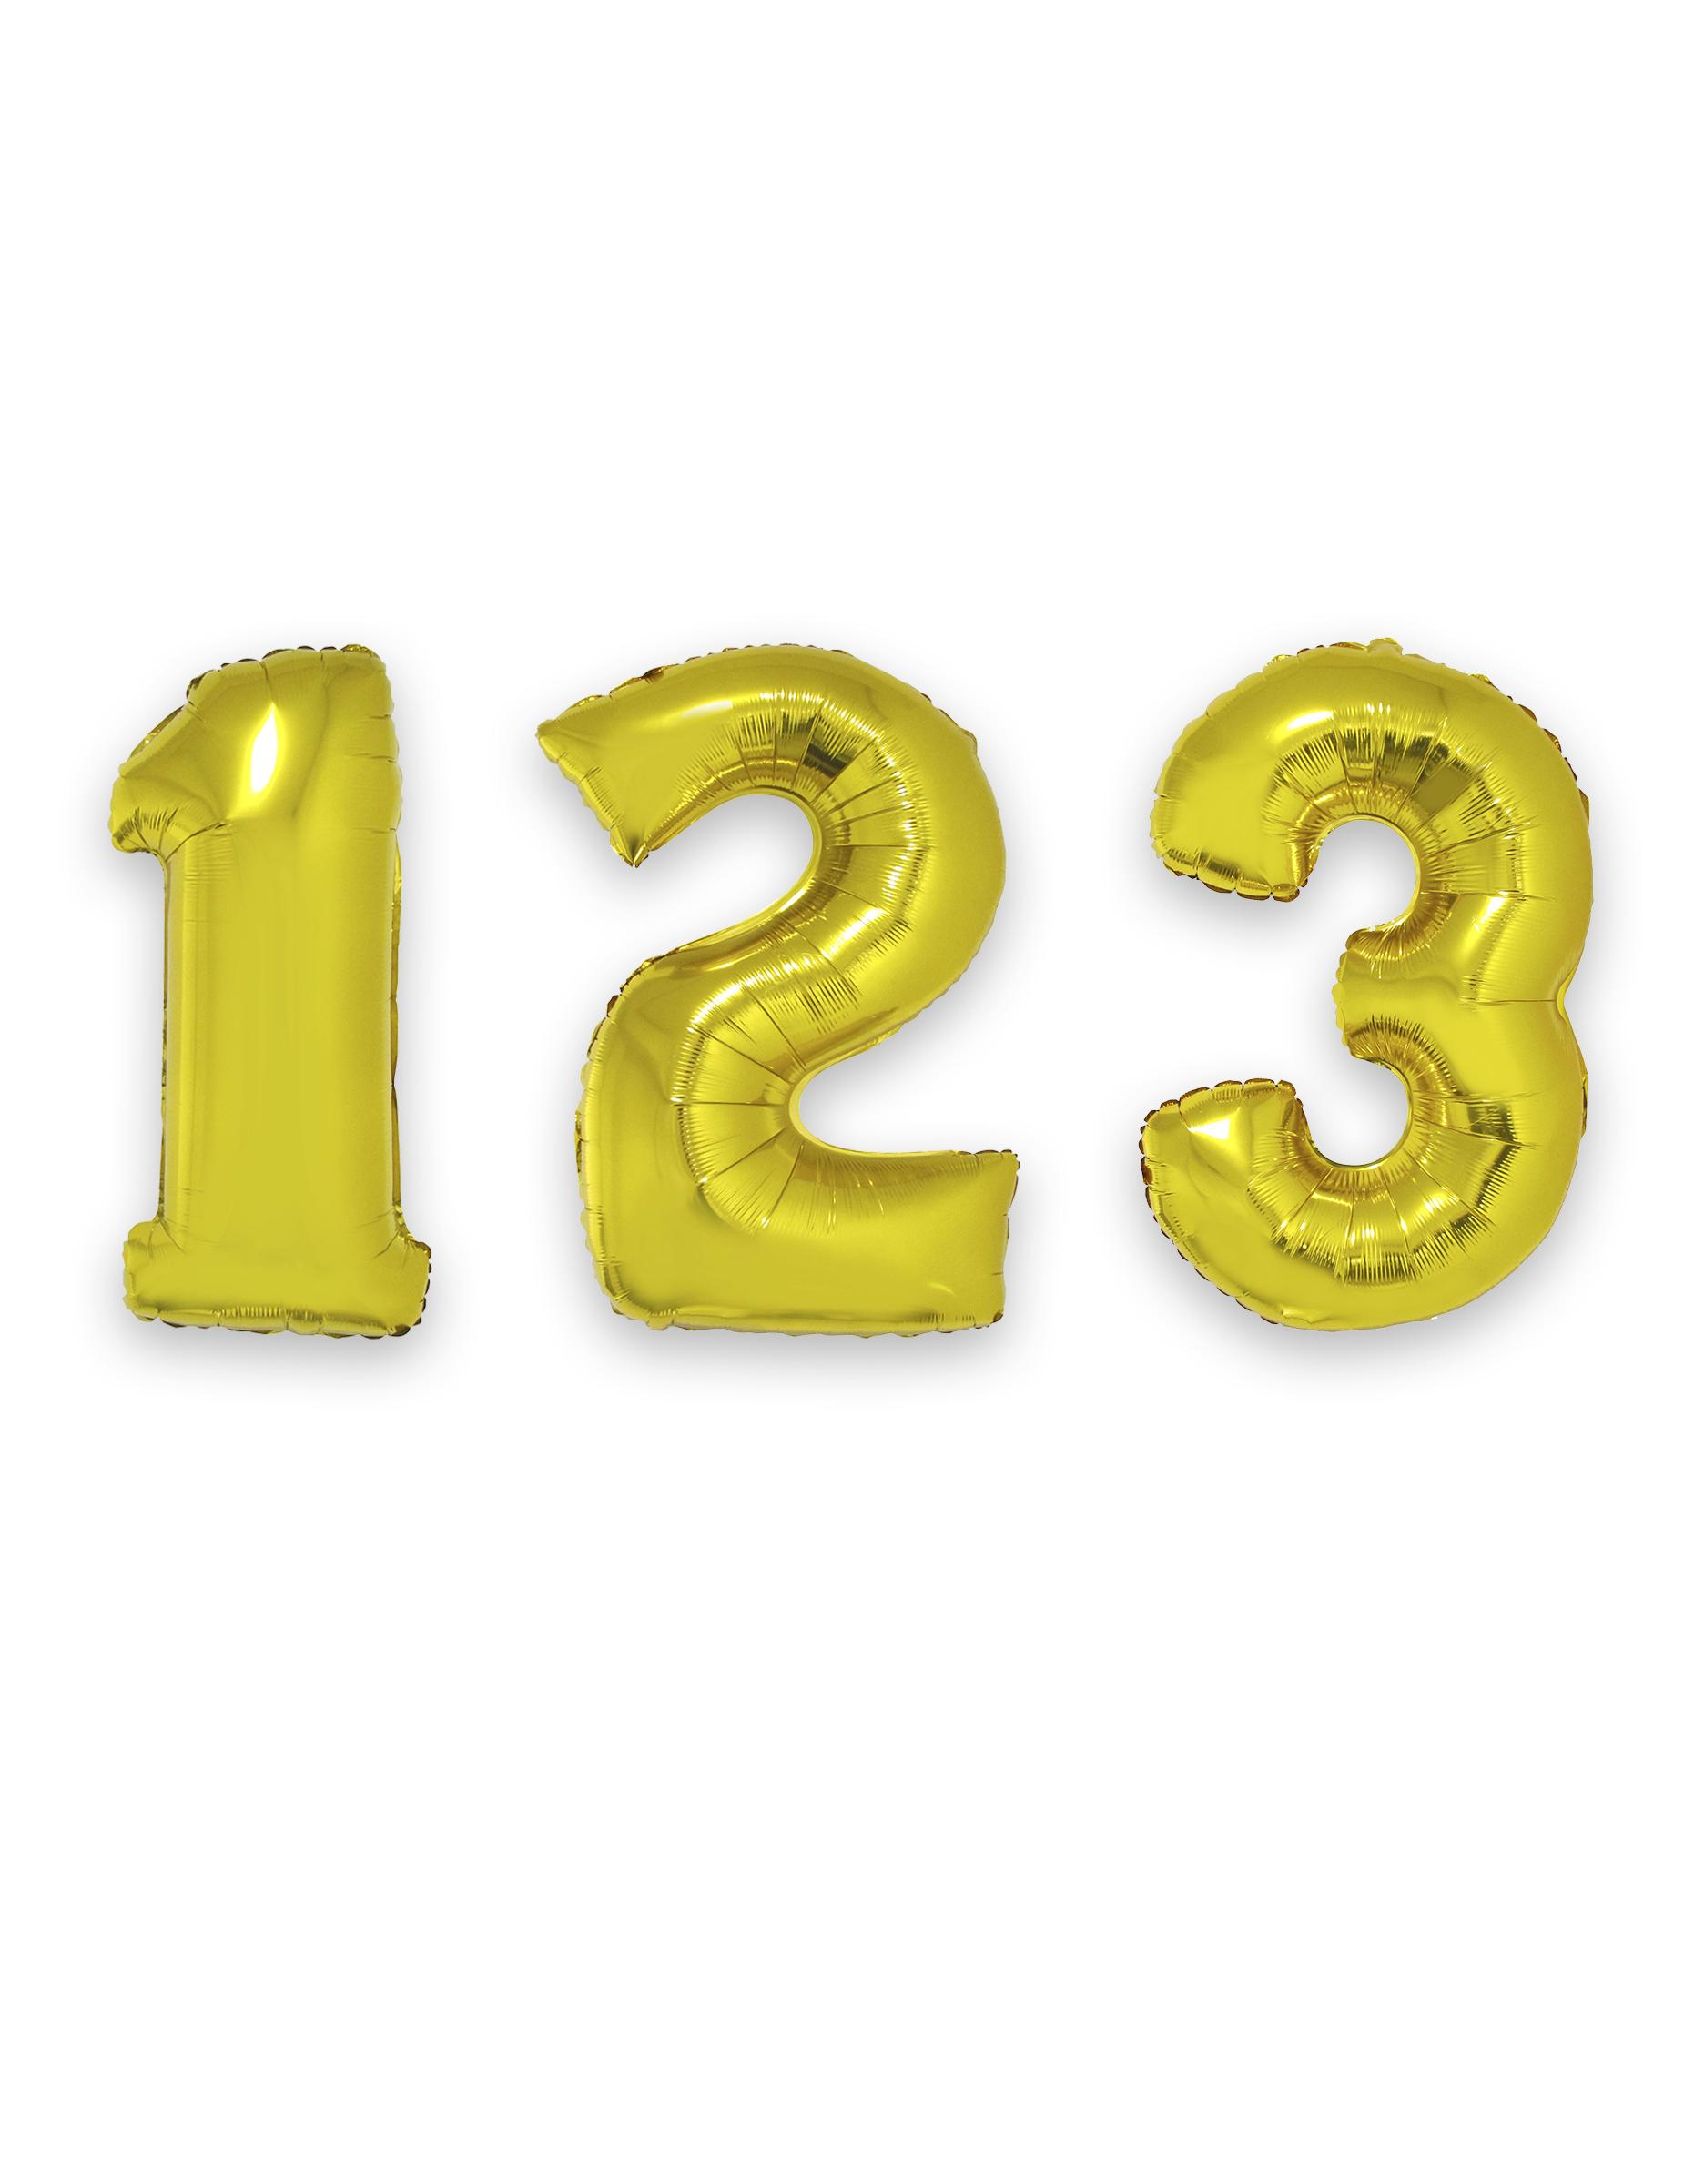 #Zahlen-Folienballon Ziffern Raumdekoration gold 1m#